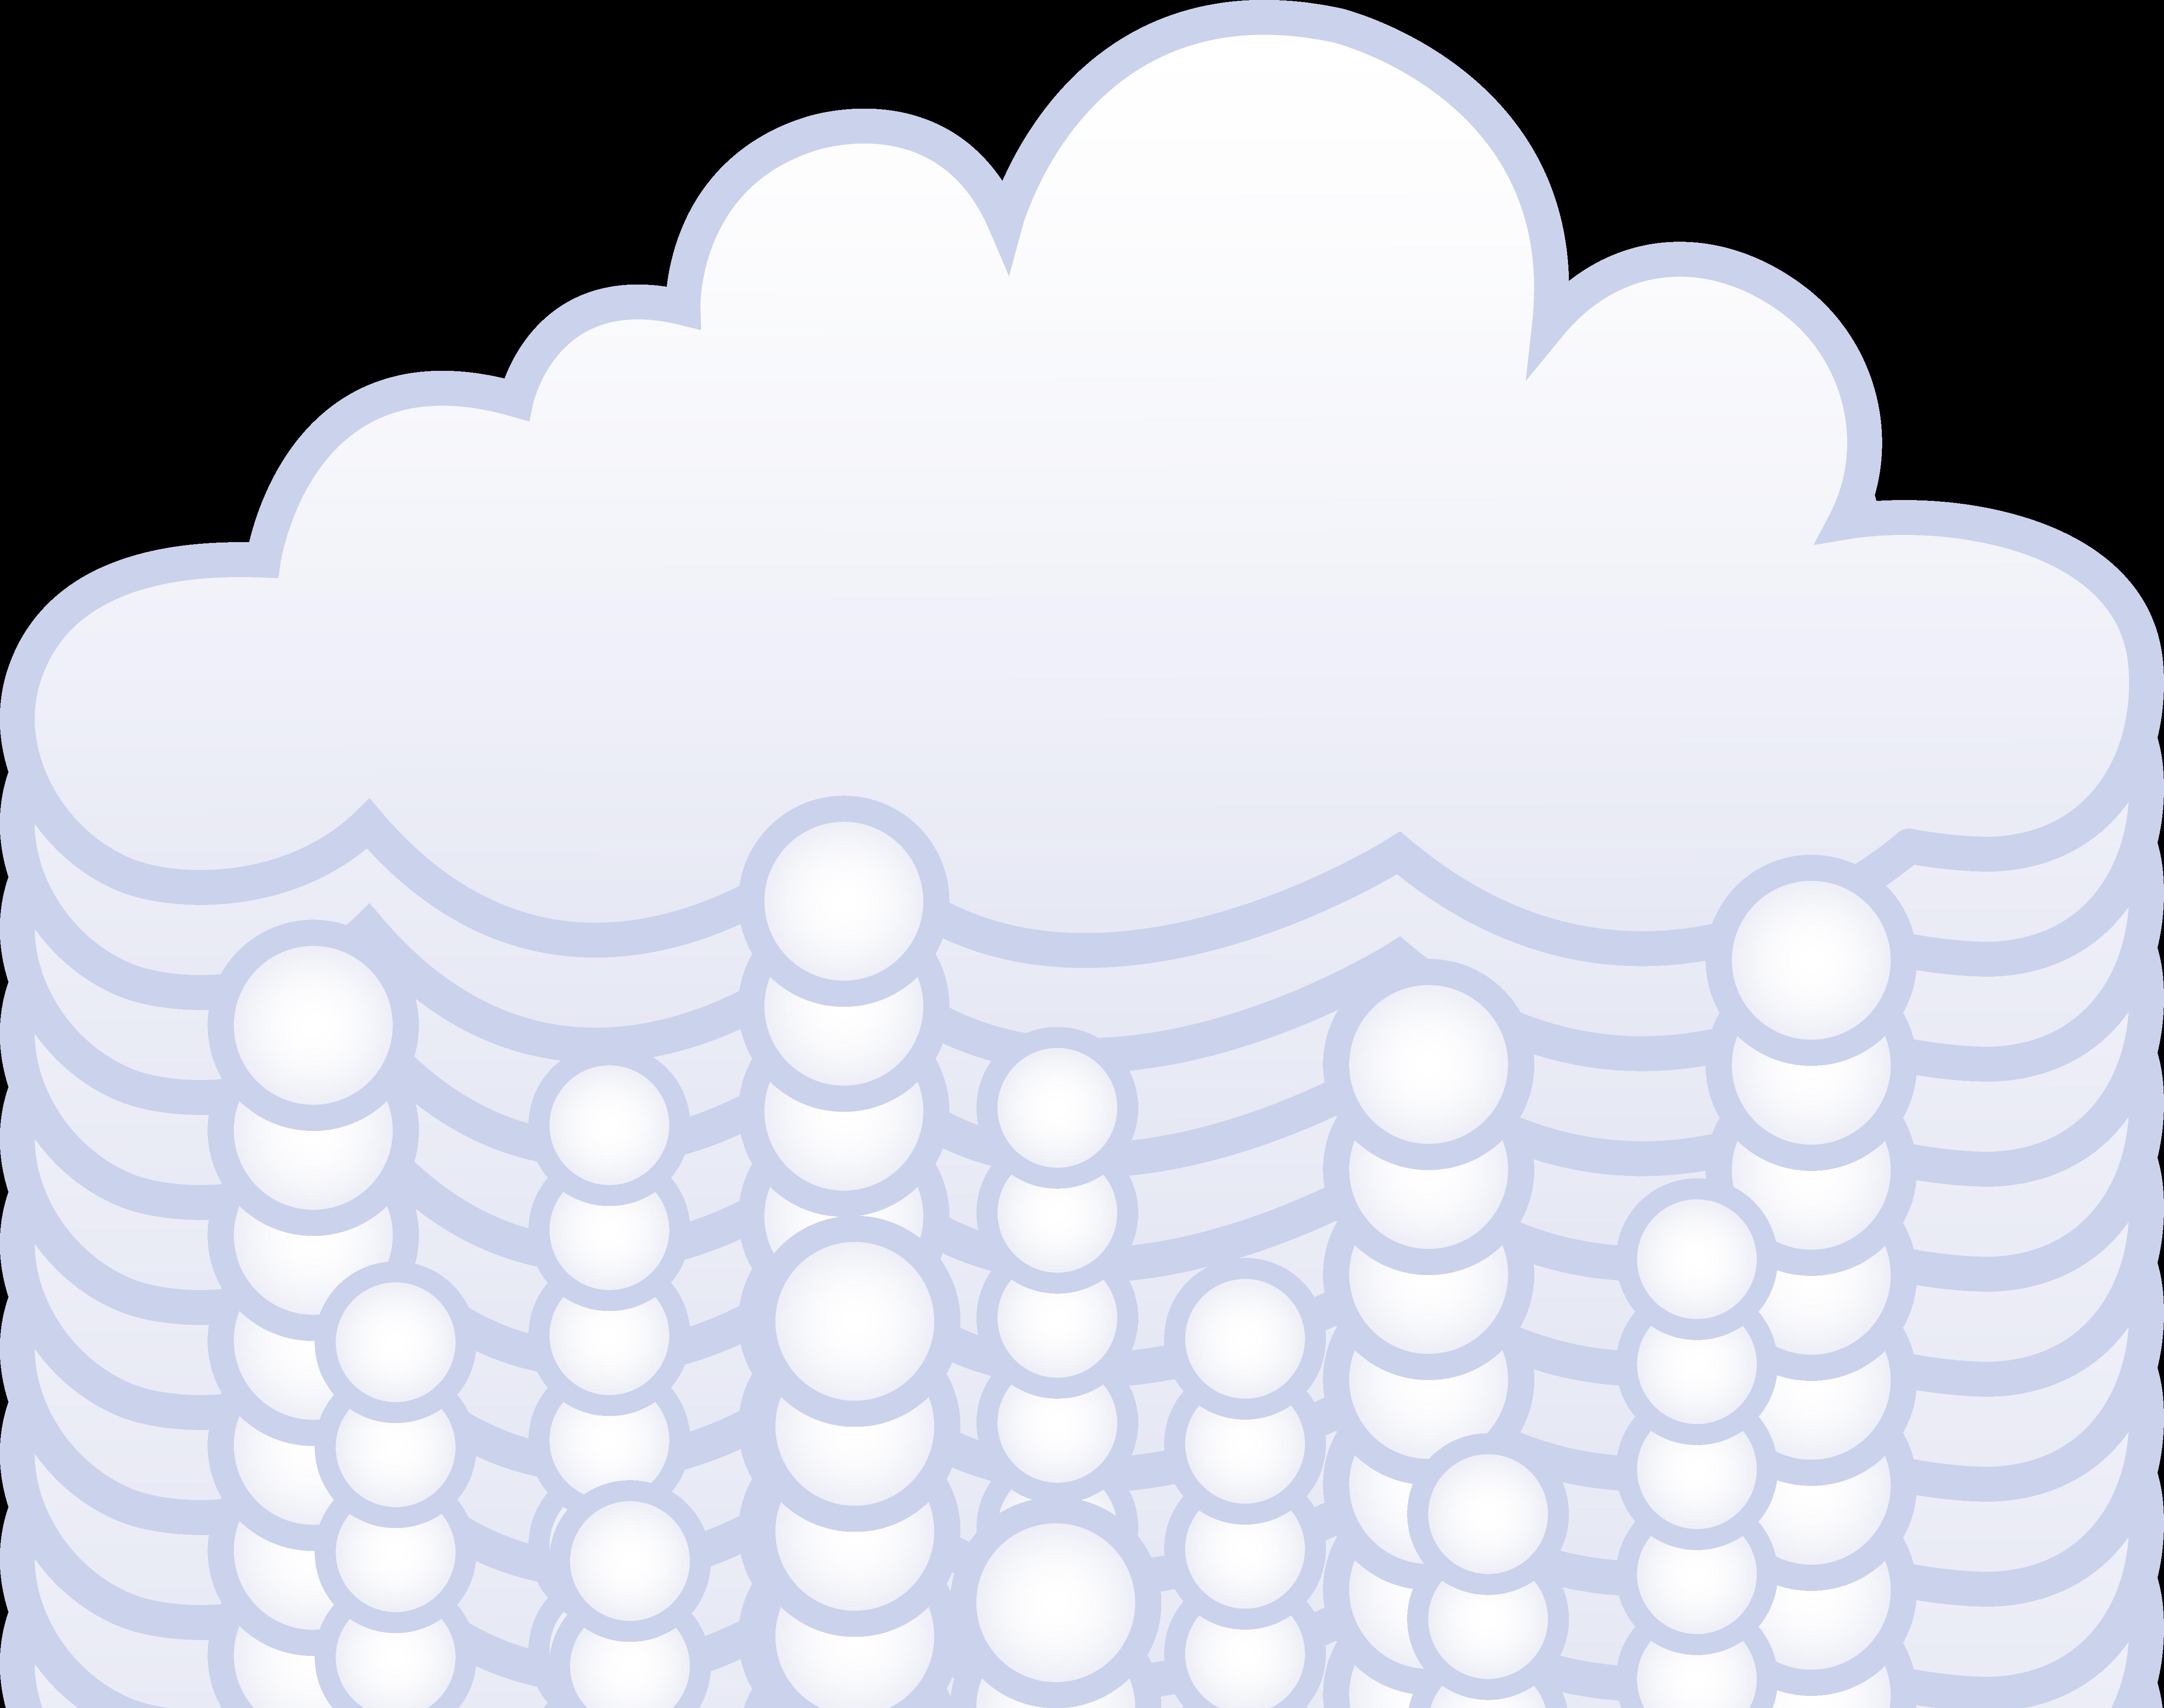 5192x4099 Snowing White Winter Cloud